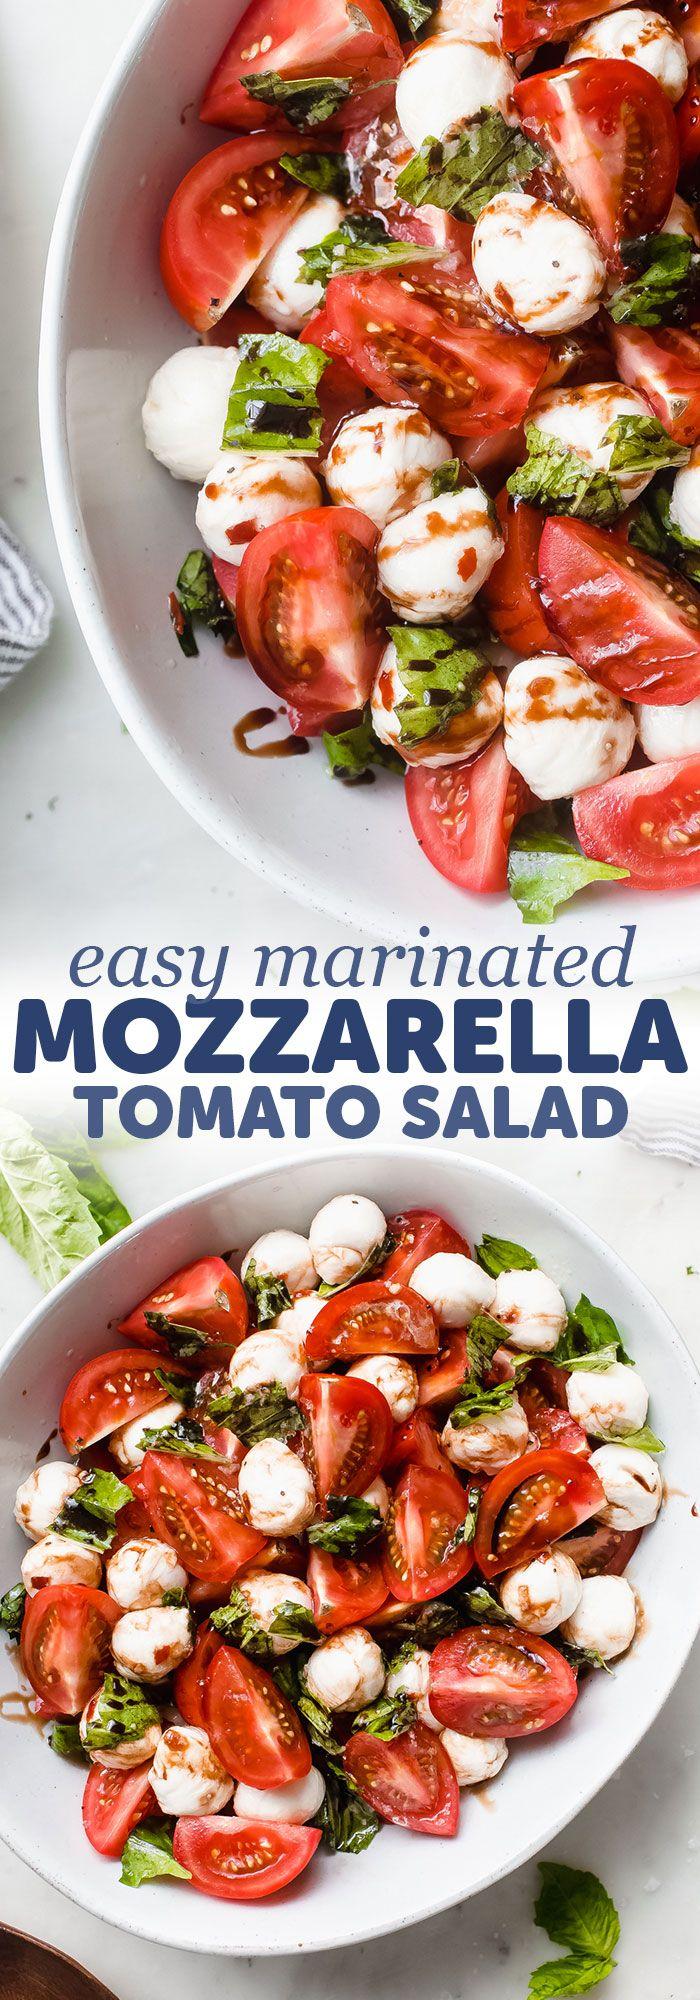 Marinated Mozzarella Tomato Salad